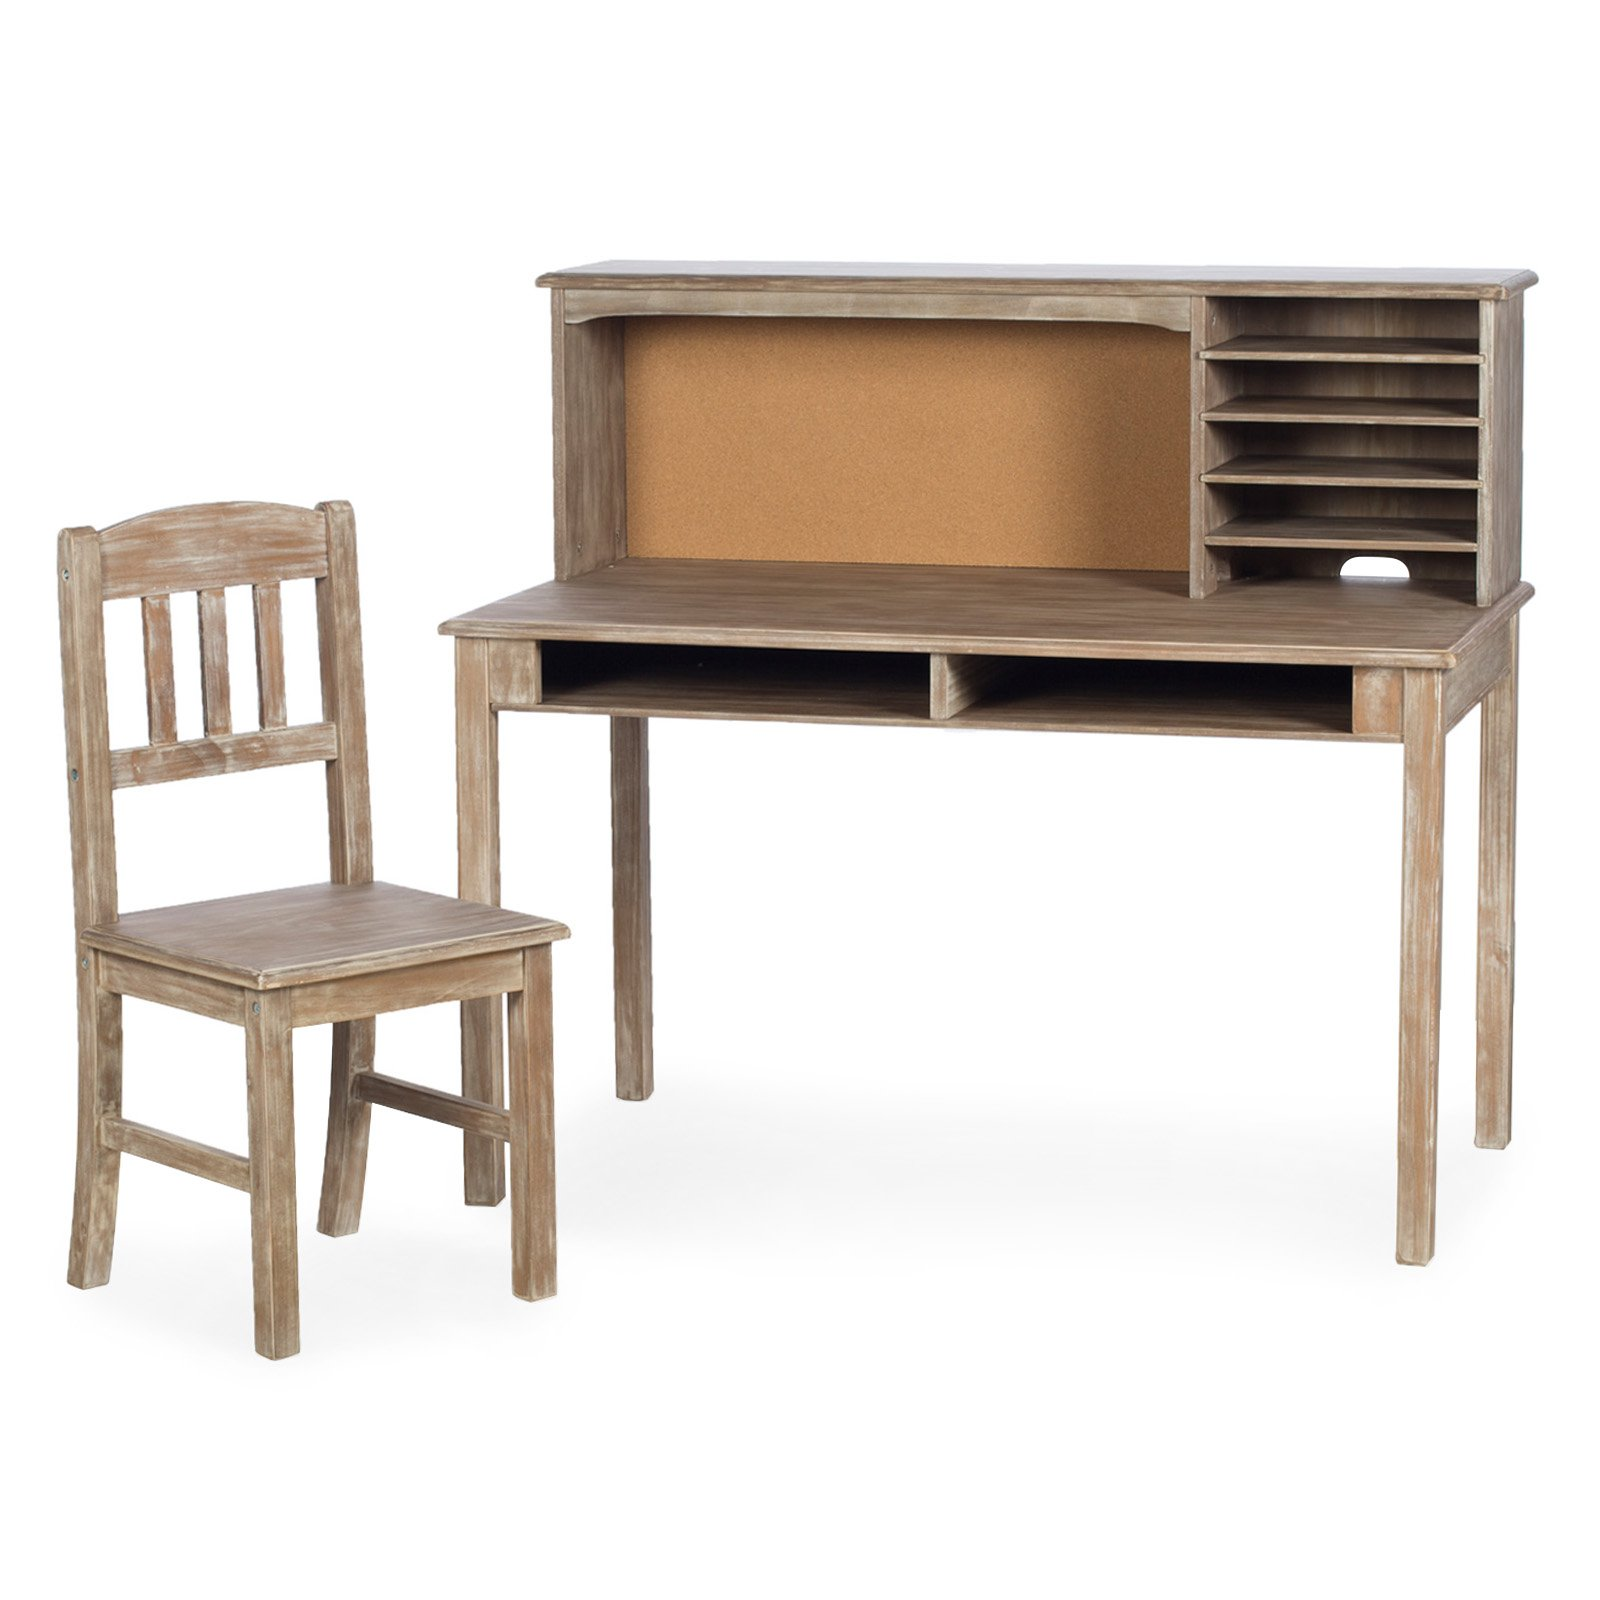 Guidecraft Kids Media Writing Desk & Chair Set - Weathered Wood